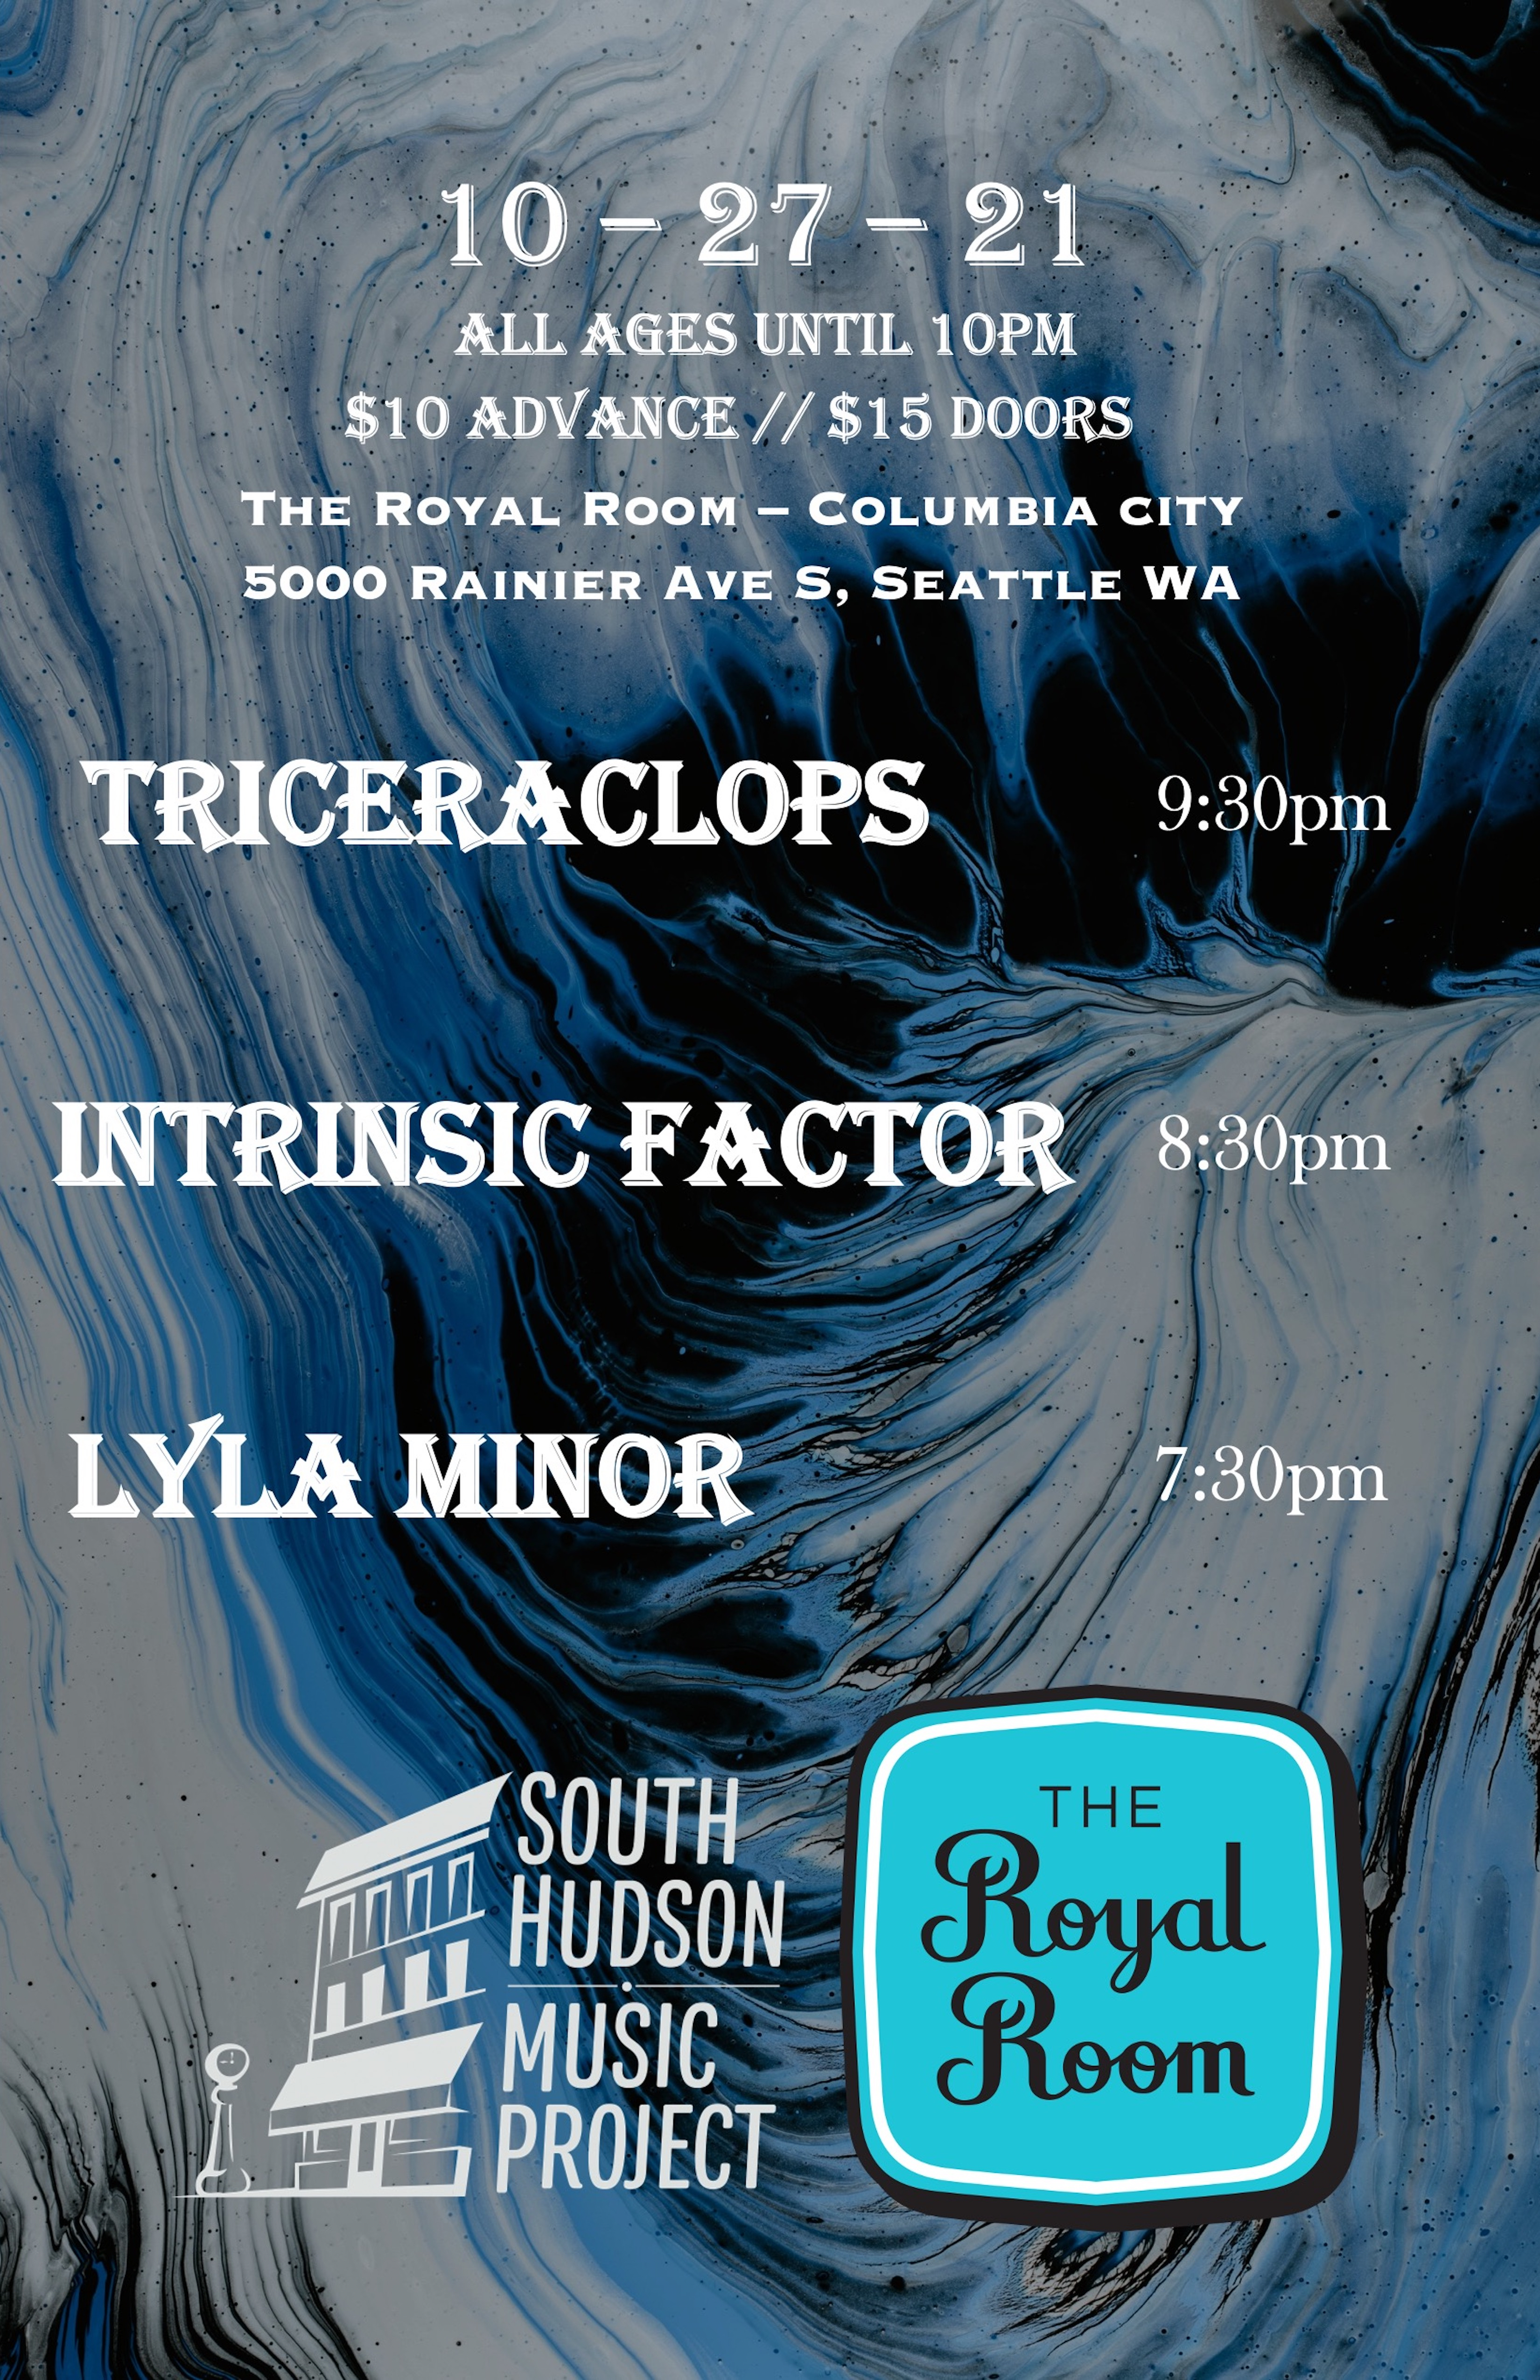 Intrinsic Factor/Triceraclops/Lyla Minor